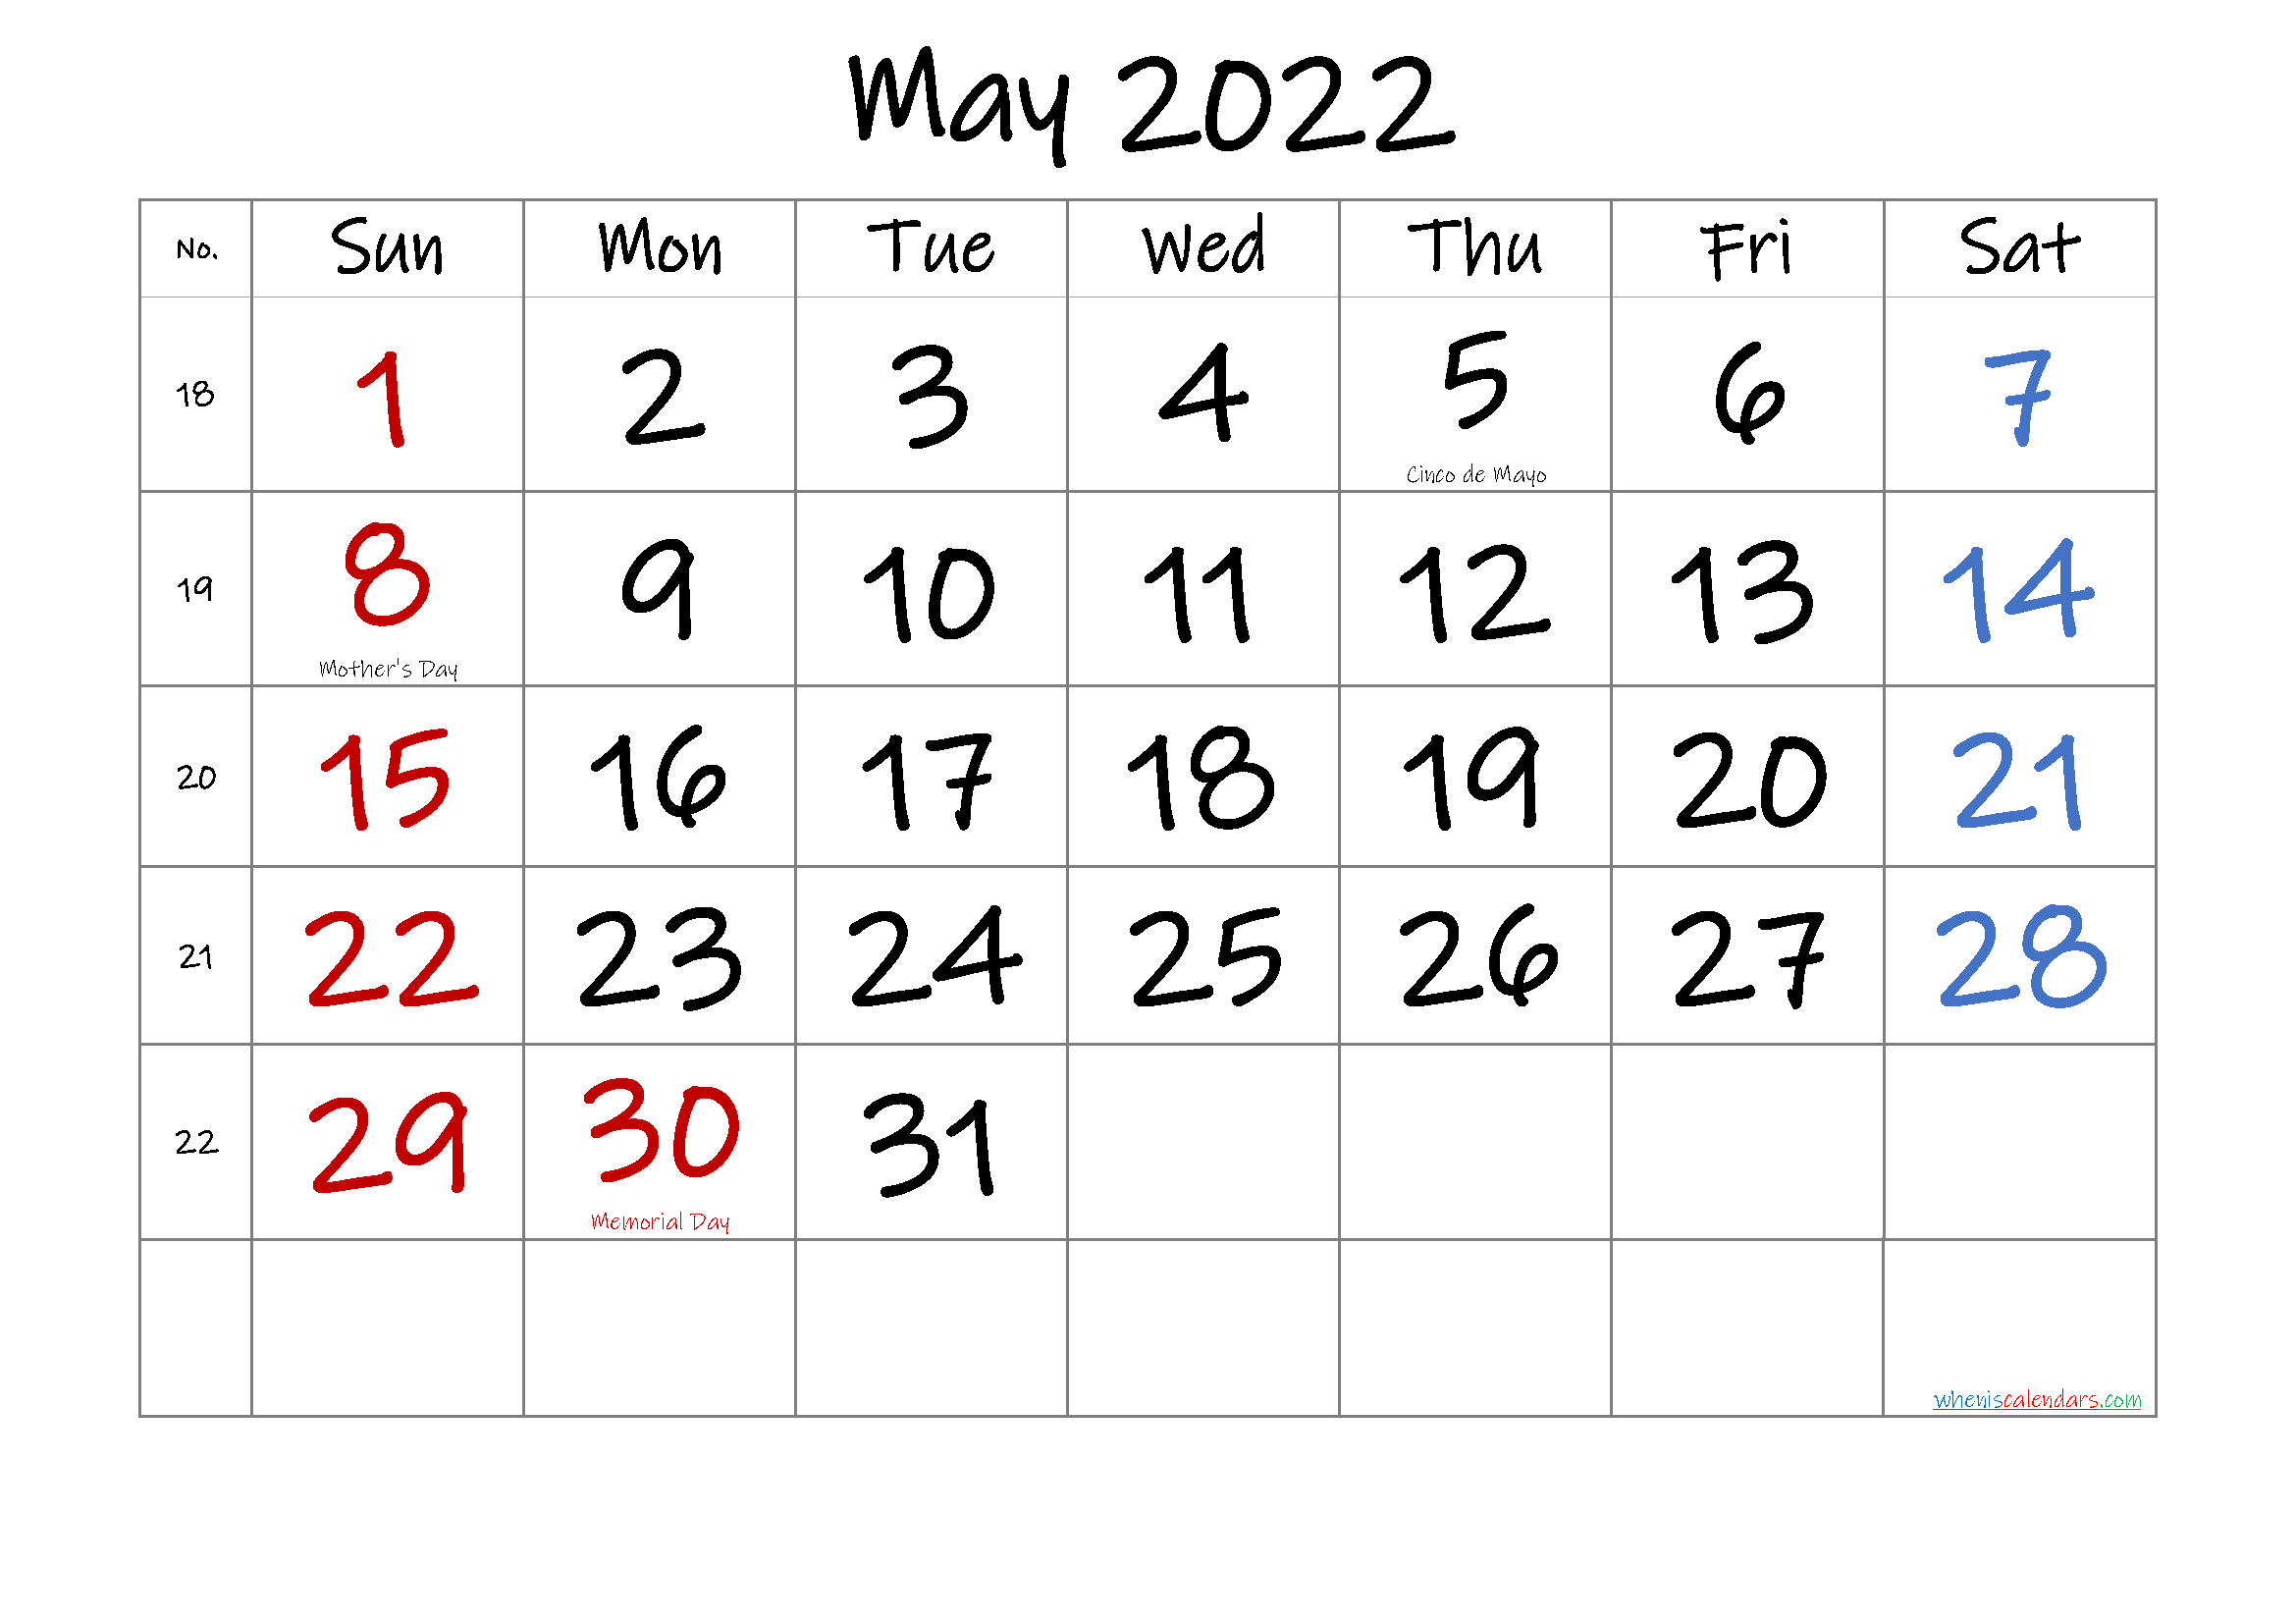 May 2022 Printable Calendar With Holidays   Free Printable regarding Printable Calendar Month May 2022 Graphics